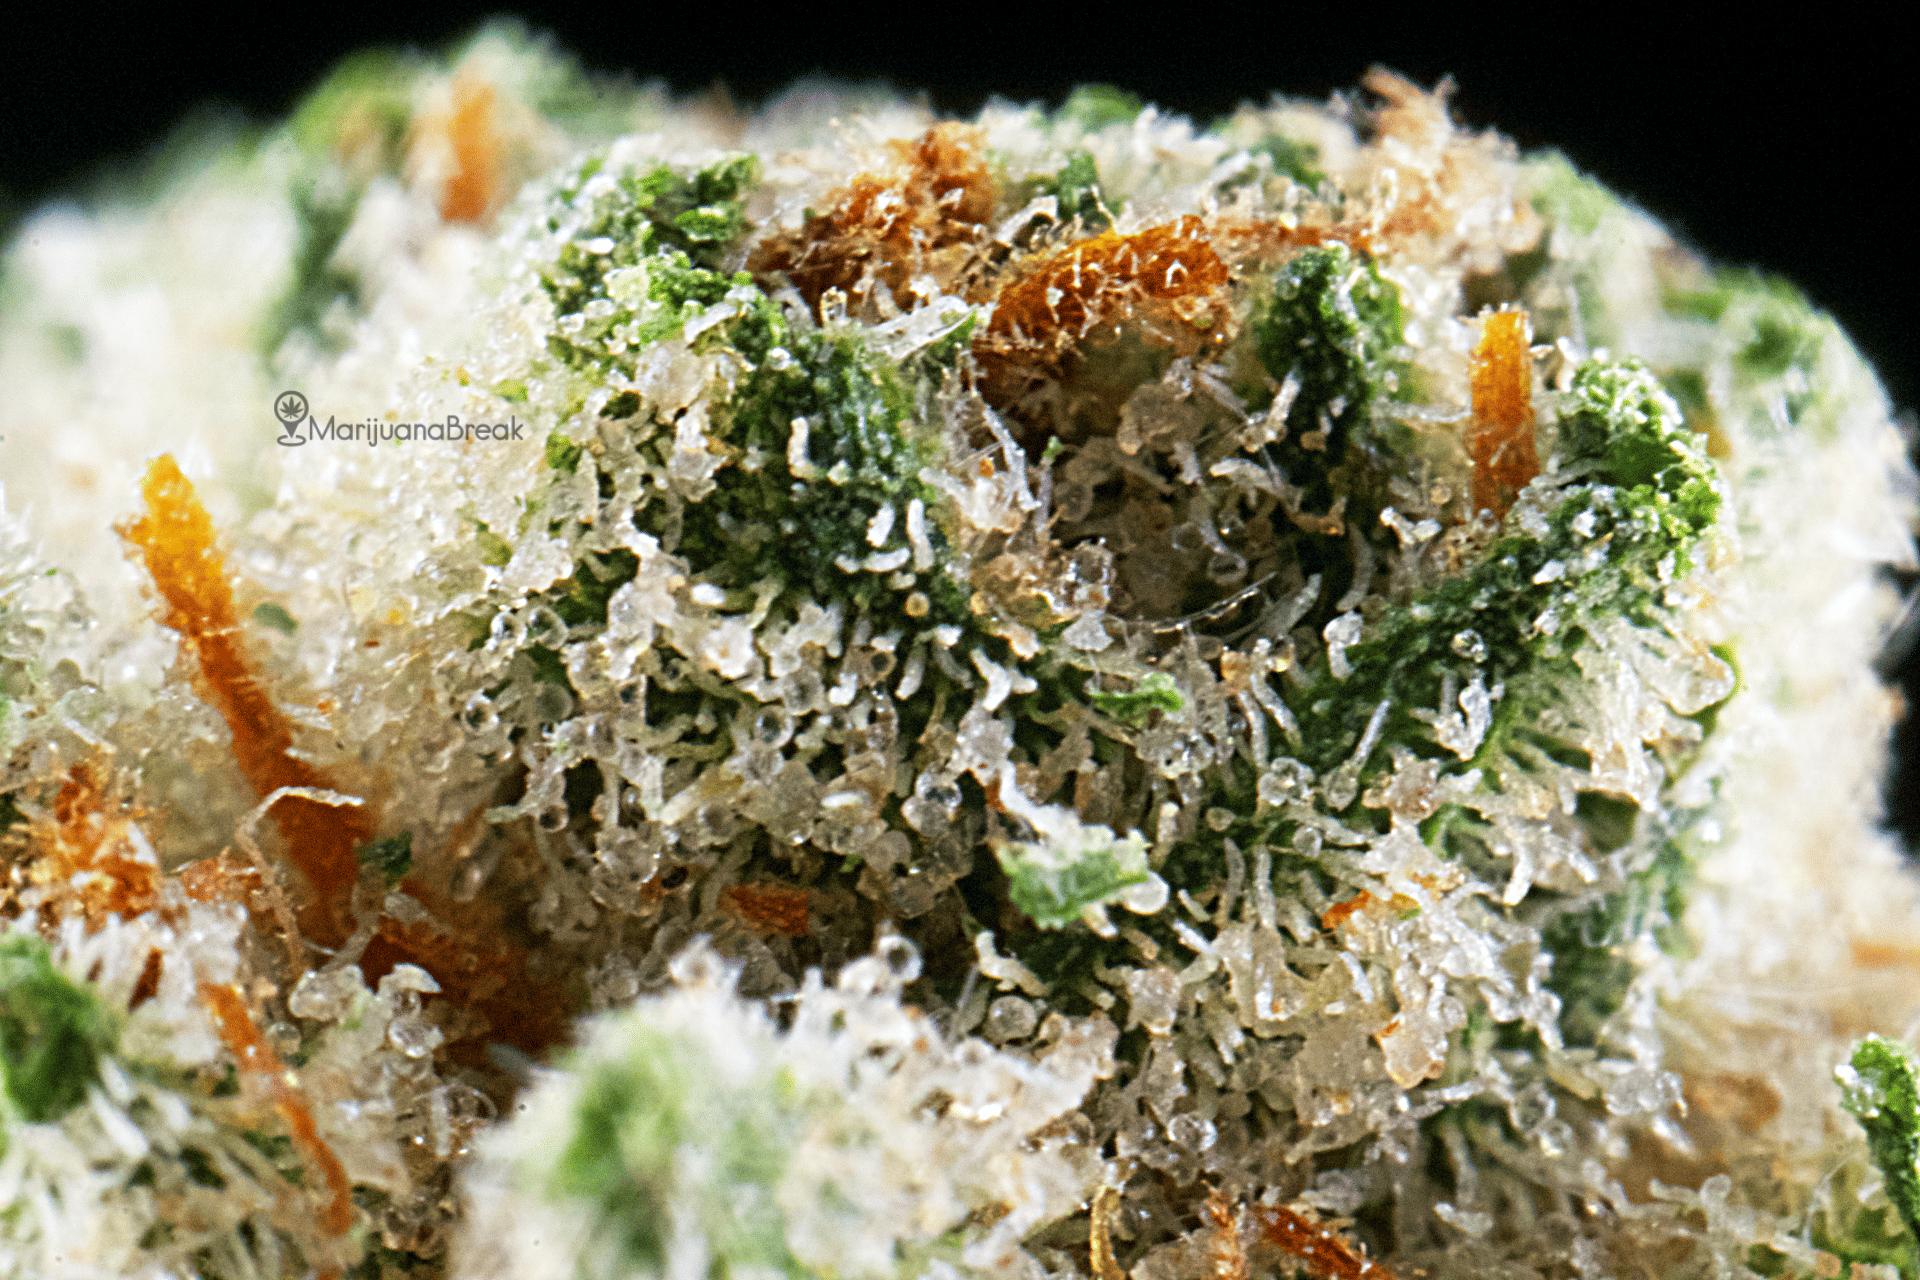 Fire OG Marijuana Strain Review